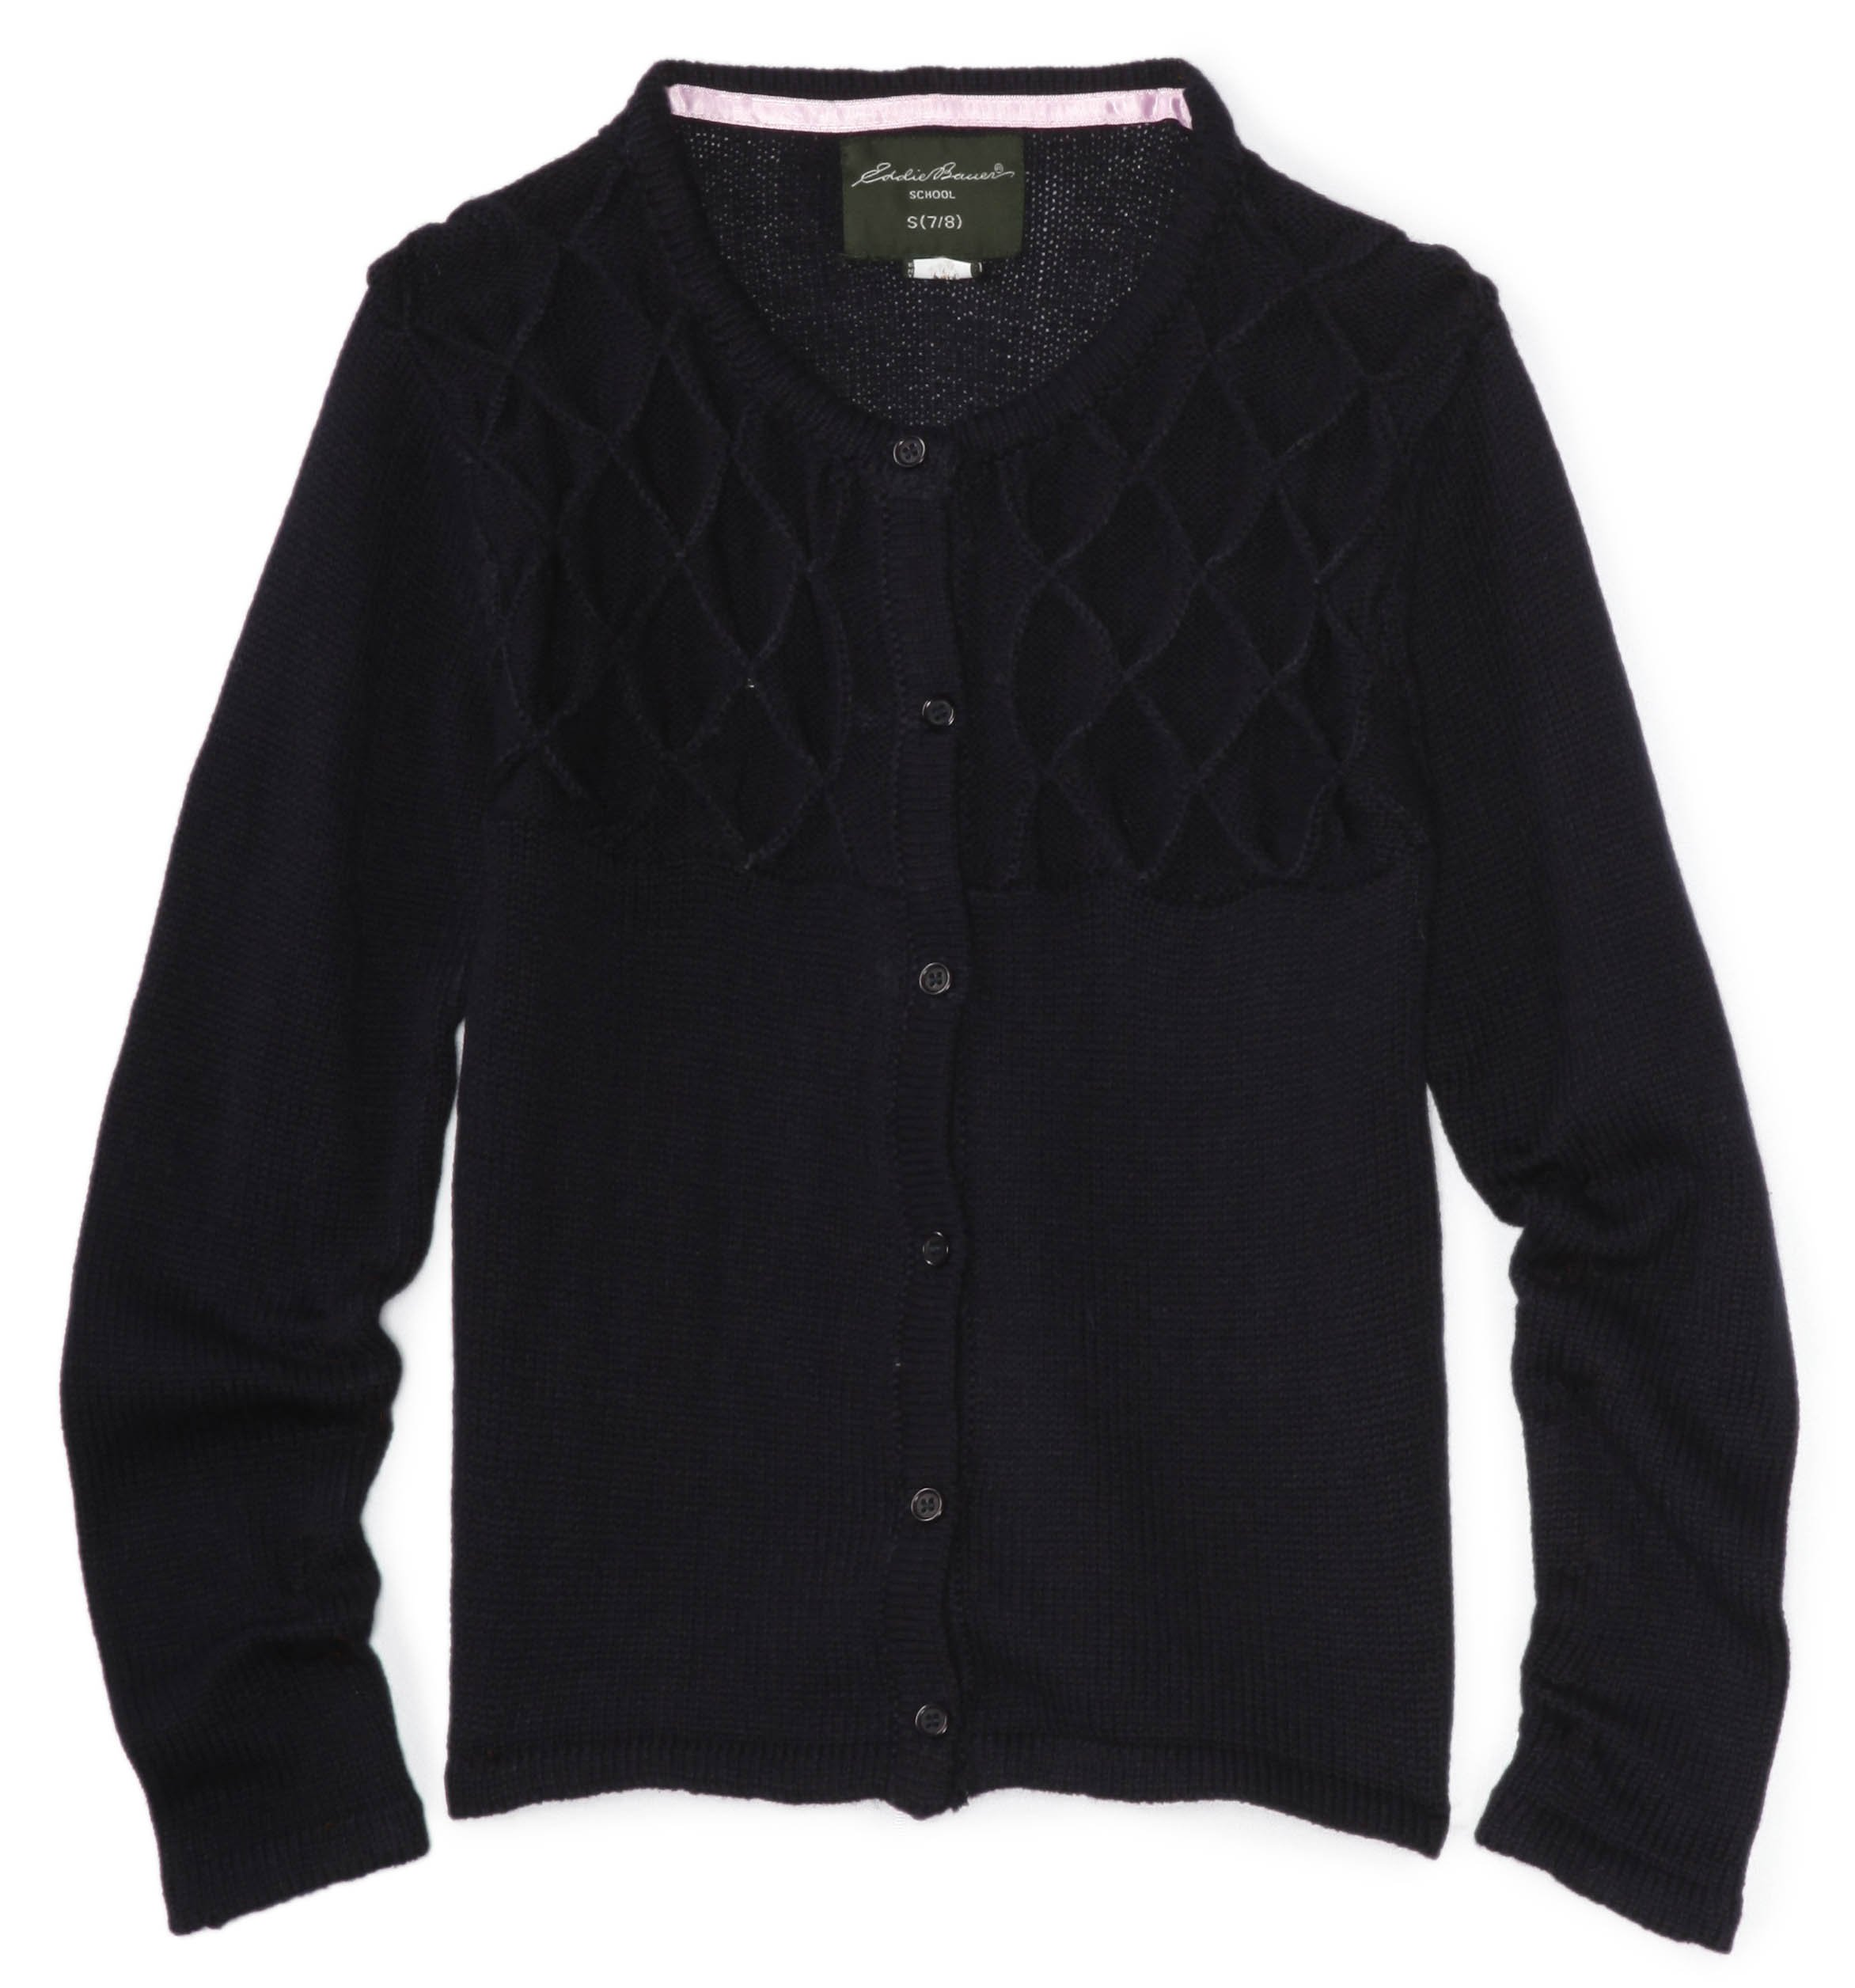 Eddie Bauer Girls' Sweater (More Styles Available), True Navy, 10/12